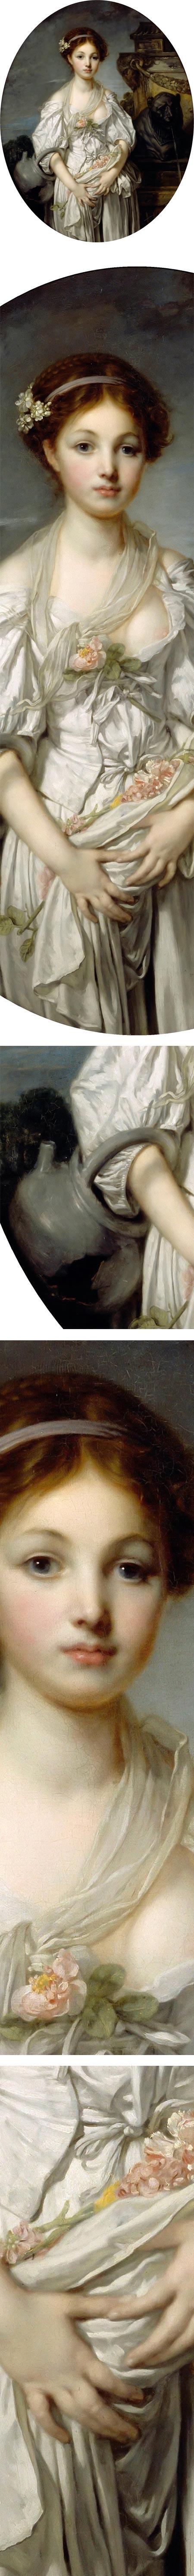 The Broken Vessel (La Cruche cassee), Jean-Baptiste Greuze